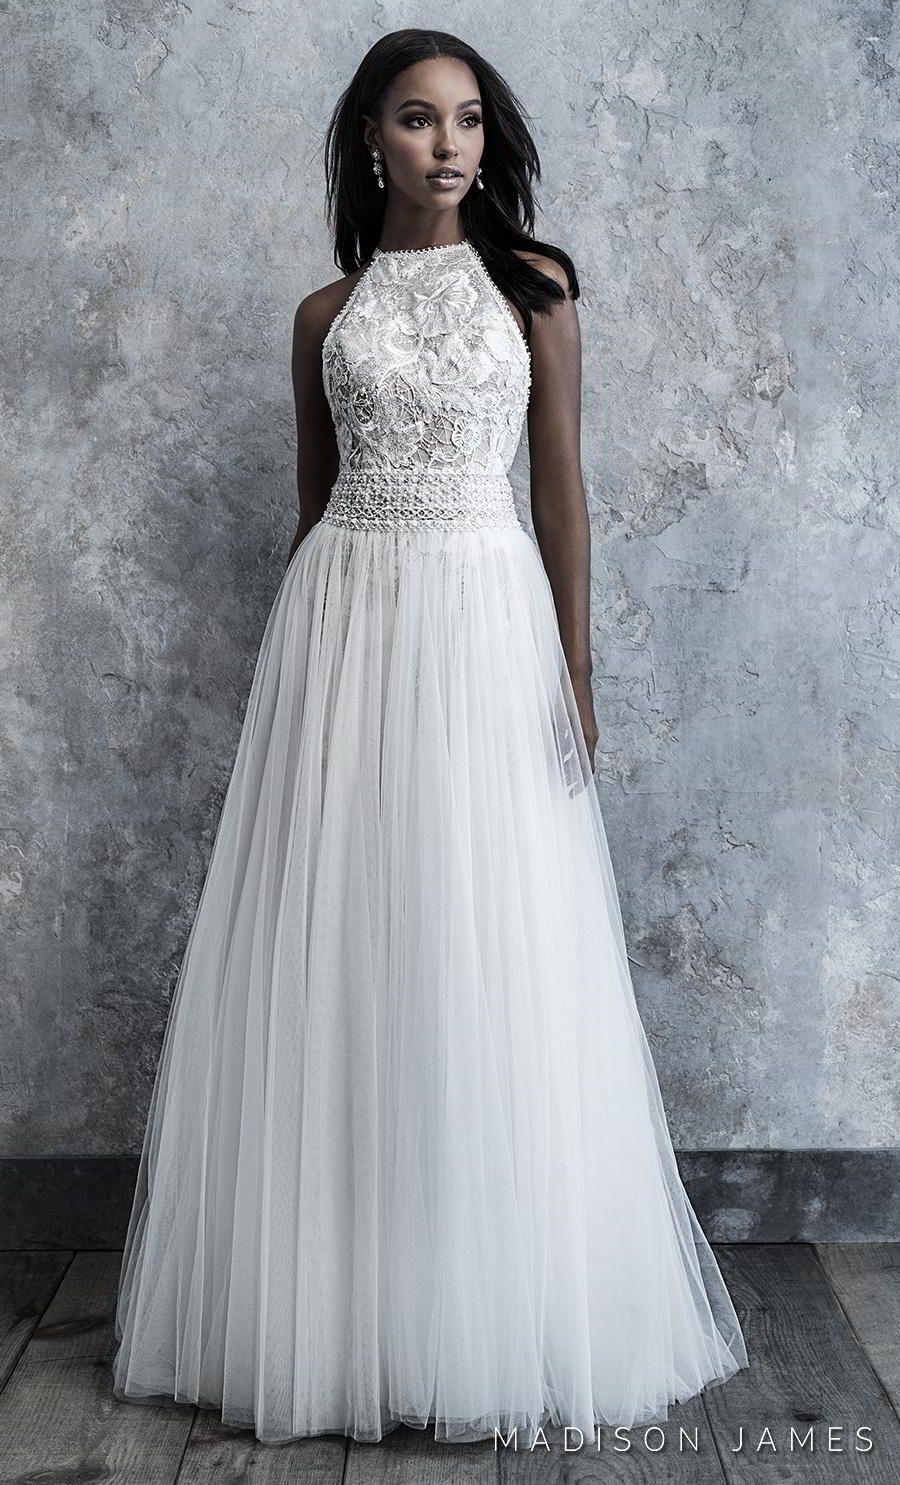 Madison James 2019 bridal sleeveless halter neck heavily embellished bodice pleated skirt romantic soft a  line wedding dress keyhole back chapel